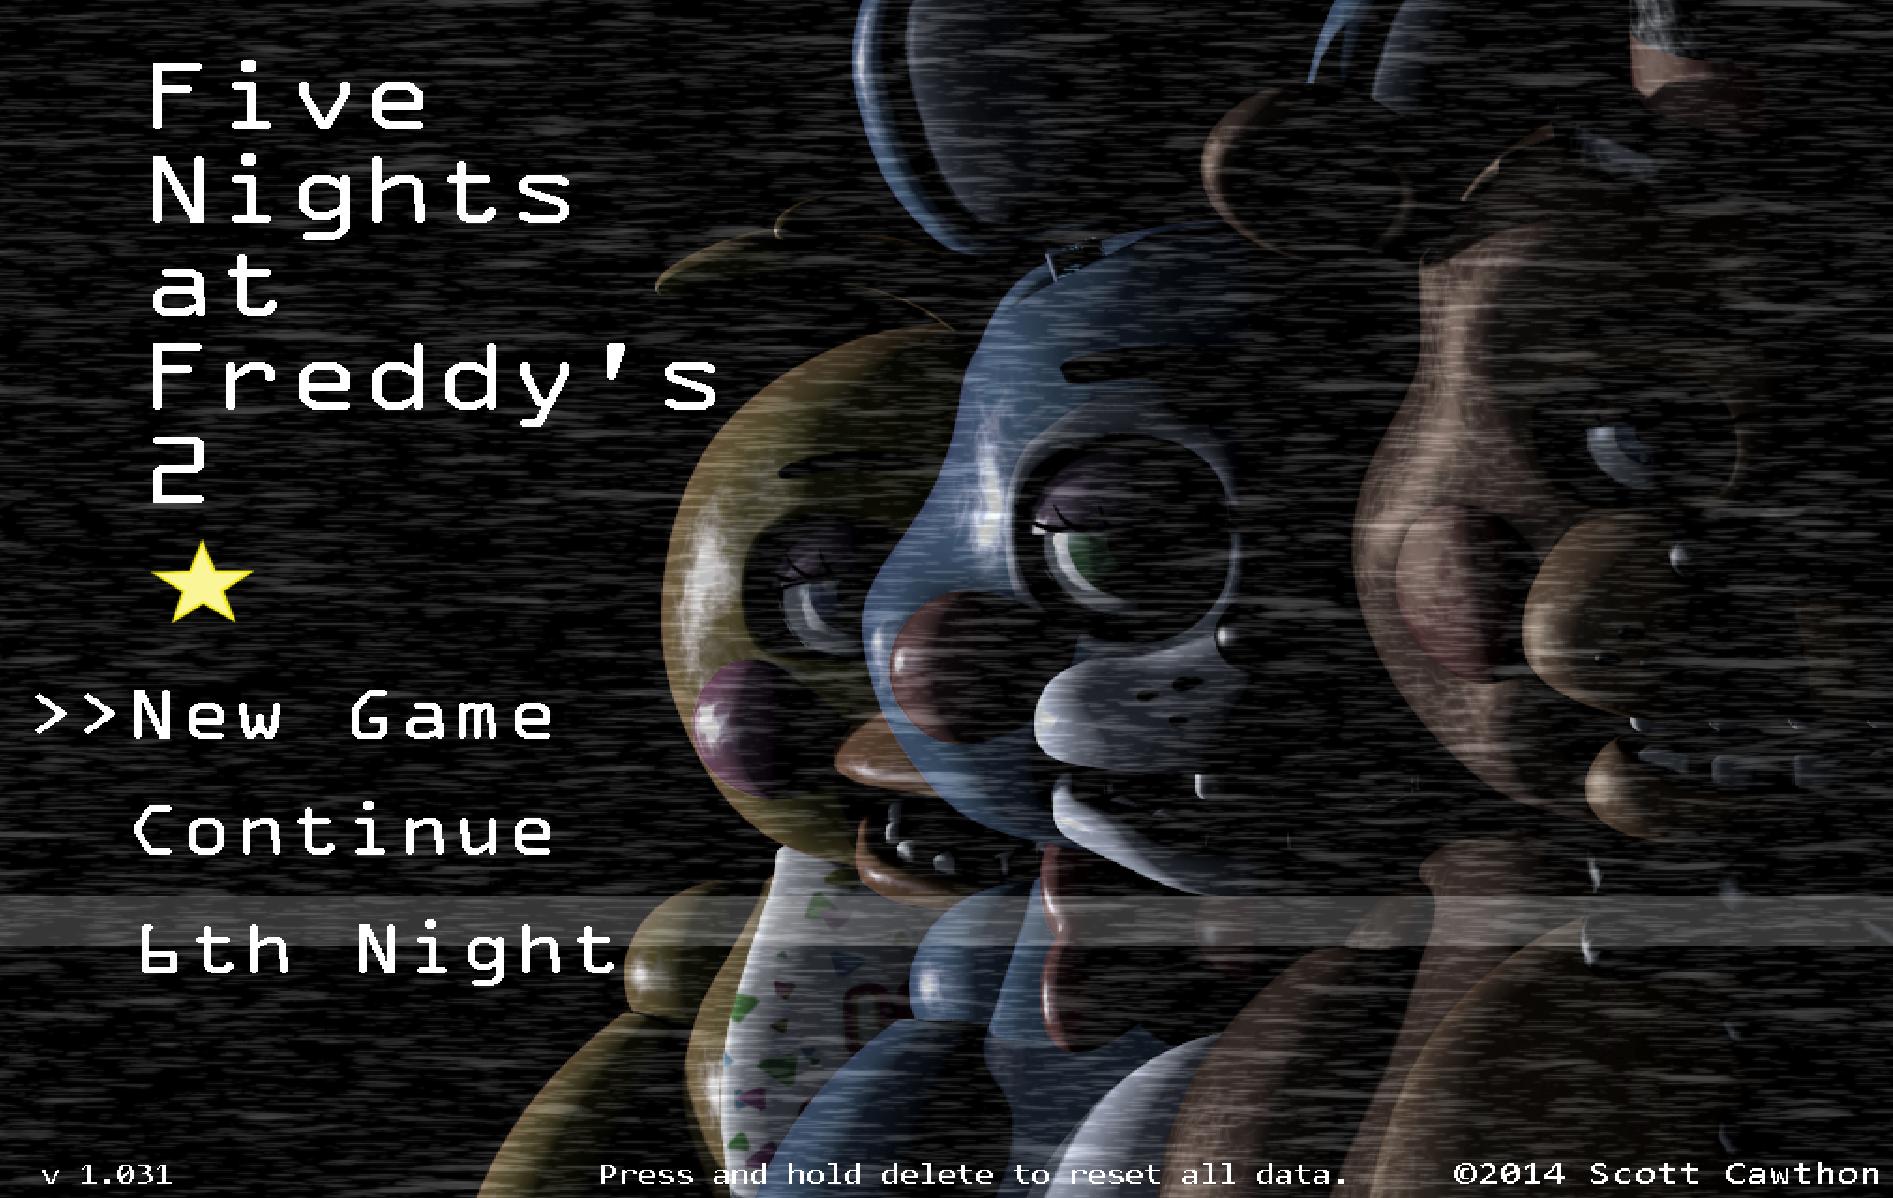 Levels (FNAF2) | Five Nights at Freddy's Wiki | FANDOM